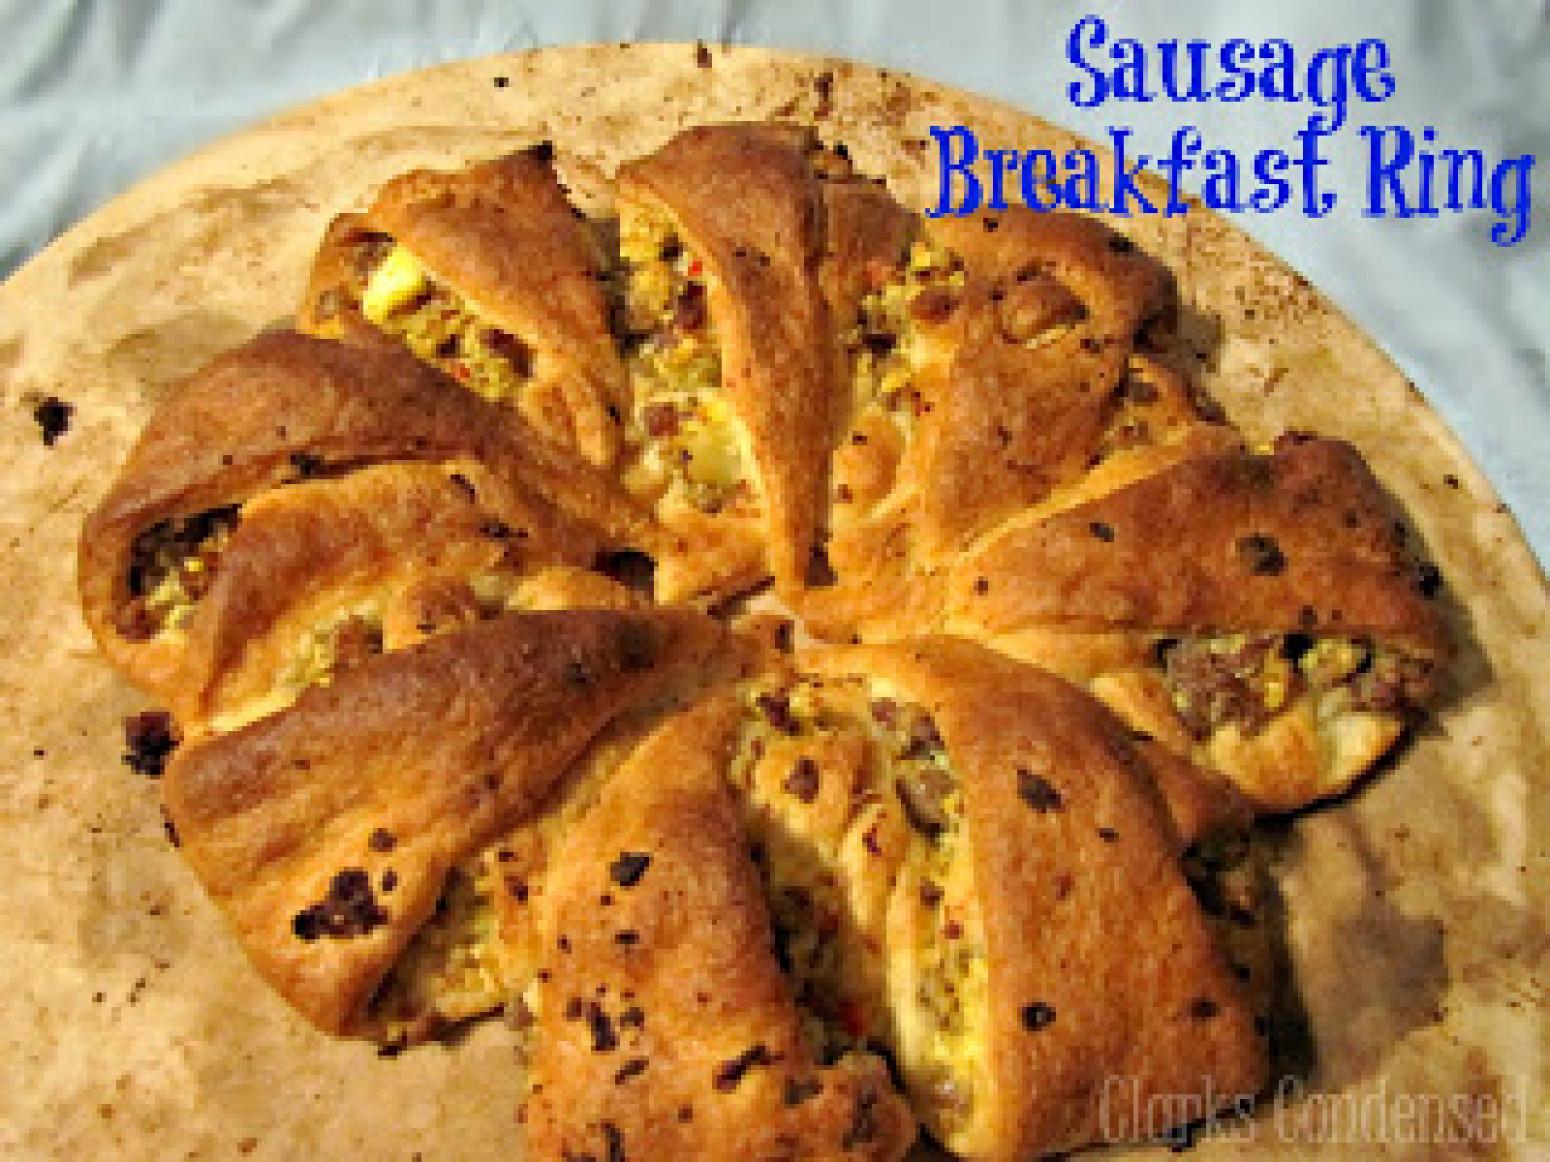 Pillsbury Crescent Roll Breakfast Recipes  Sausage Crescent Roll Breakfast Ring Recipe